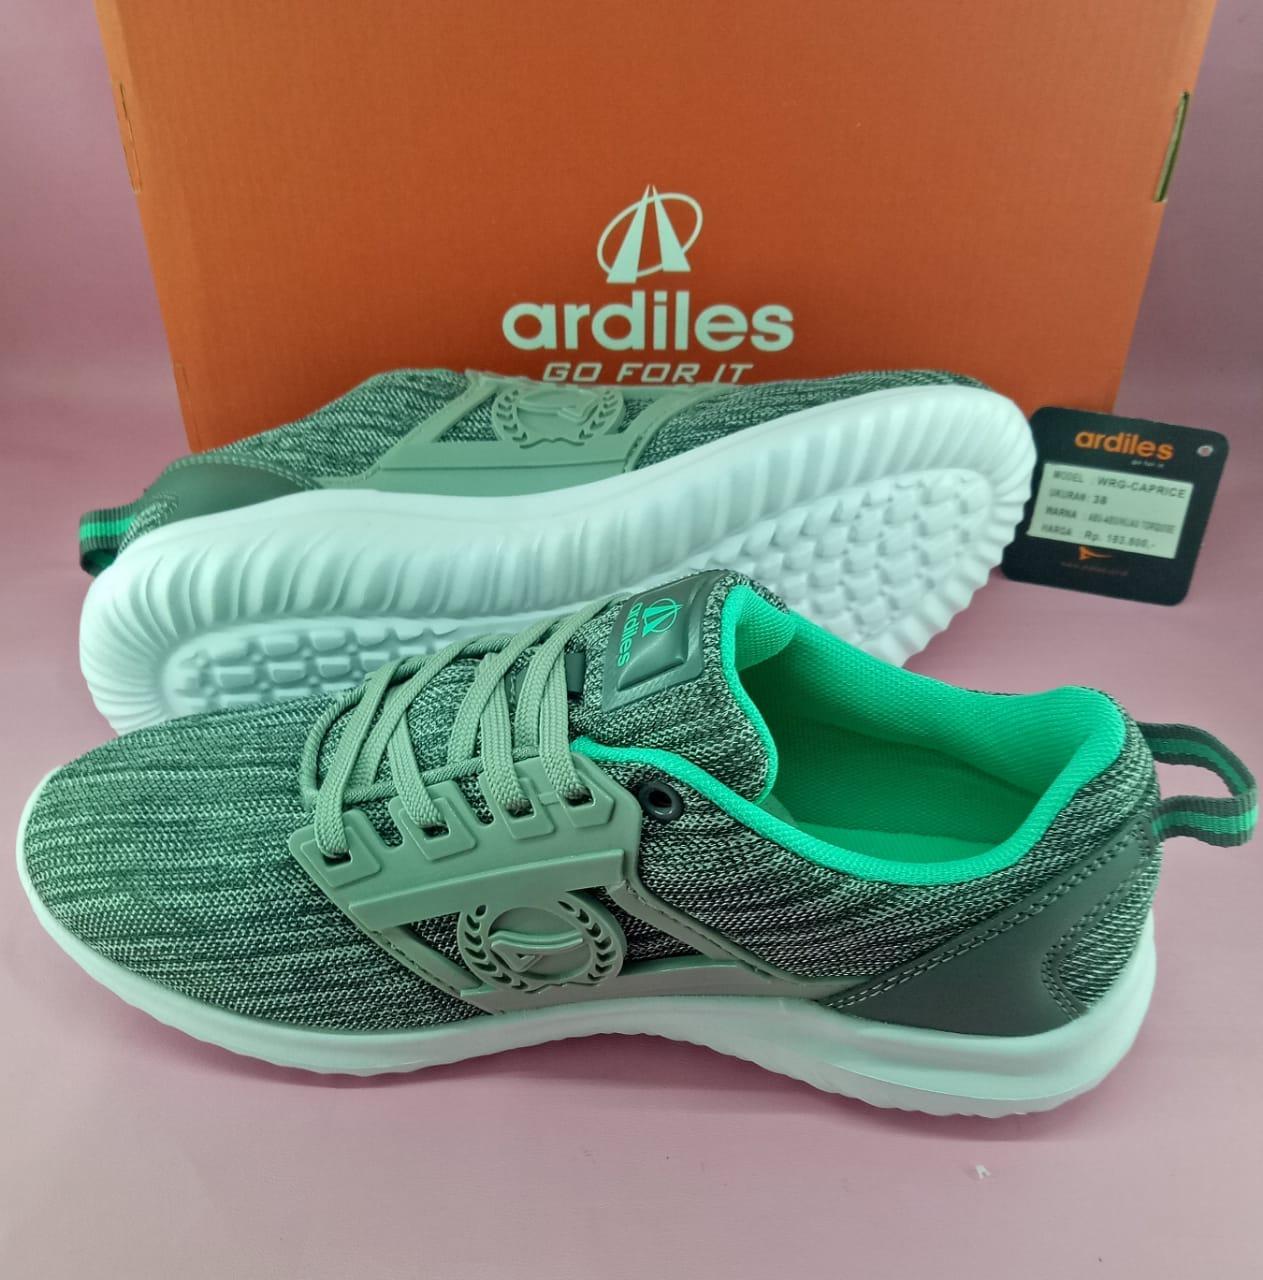 Fitur Sepatu Ardiles Running Caprice Abu Turquice 37 40 Dan Harga Estelle Women Shoes Tua 39 Detail Gambar Terkini